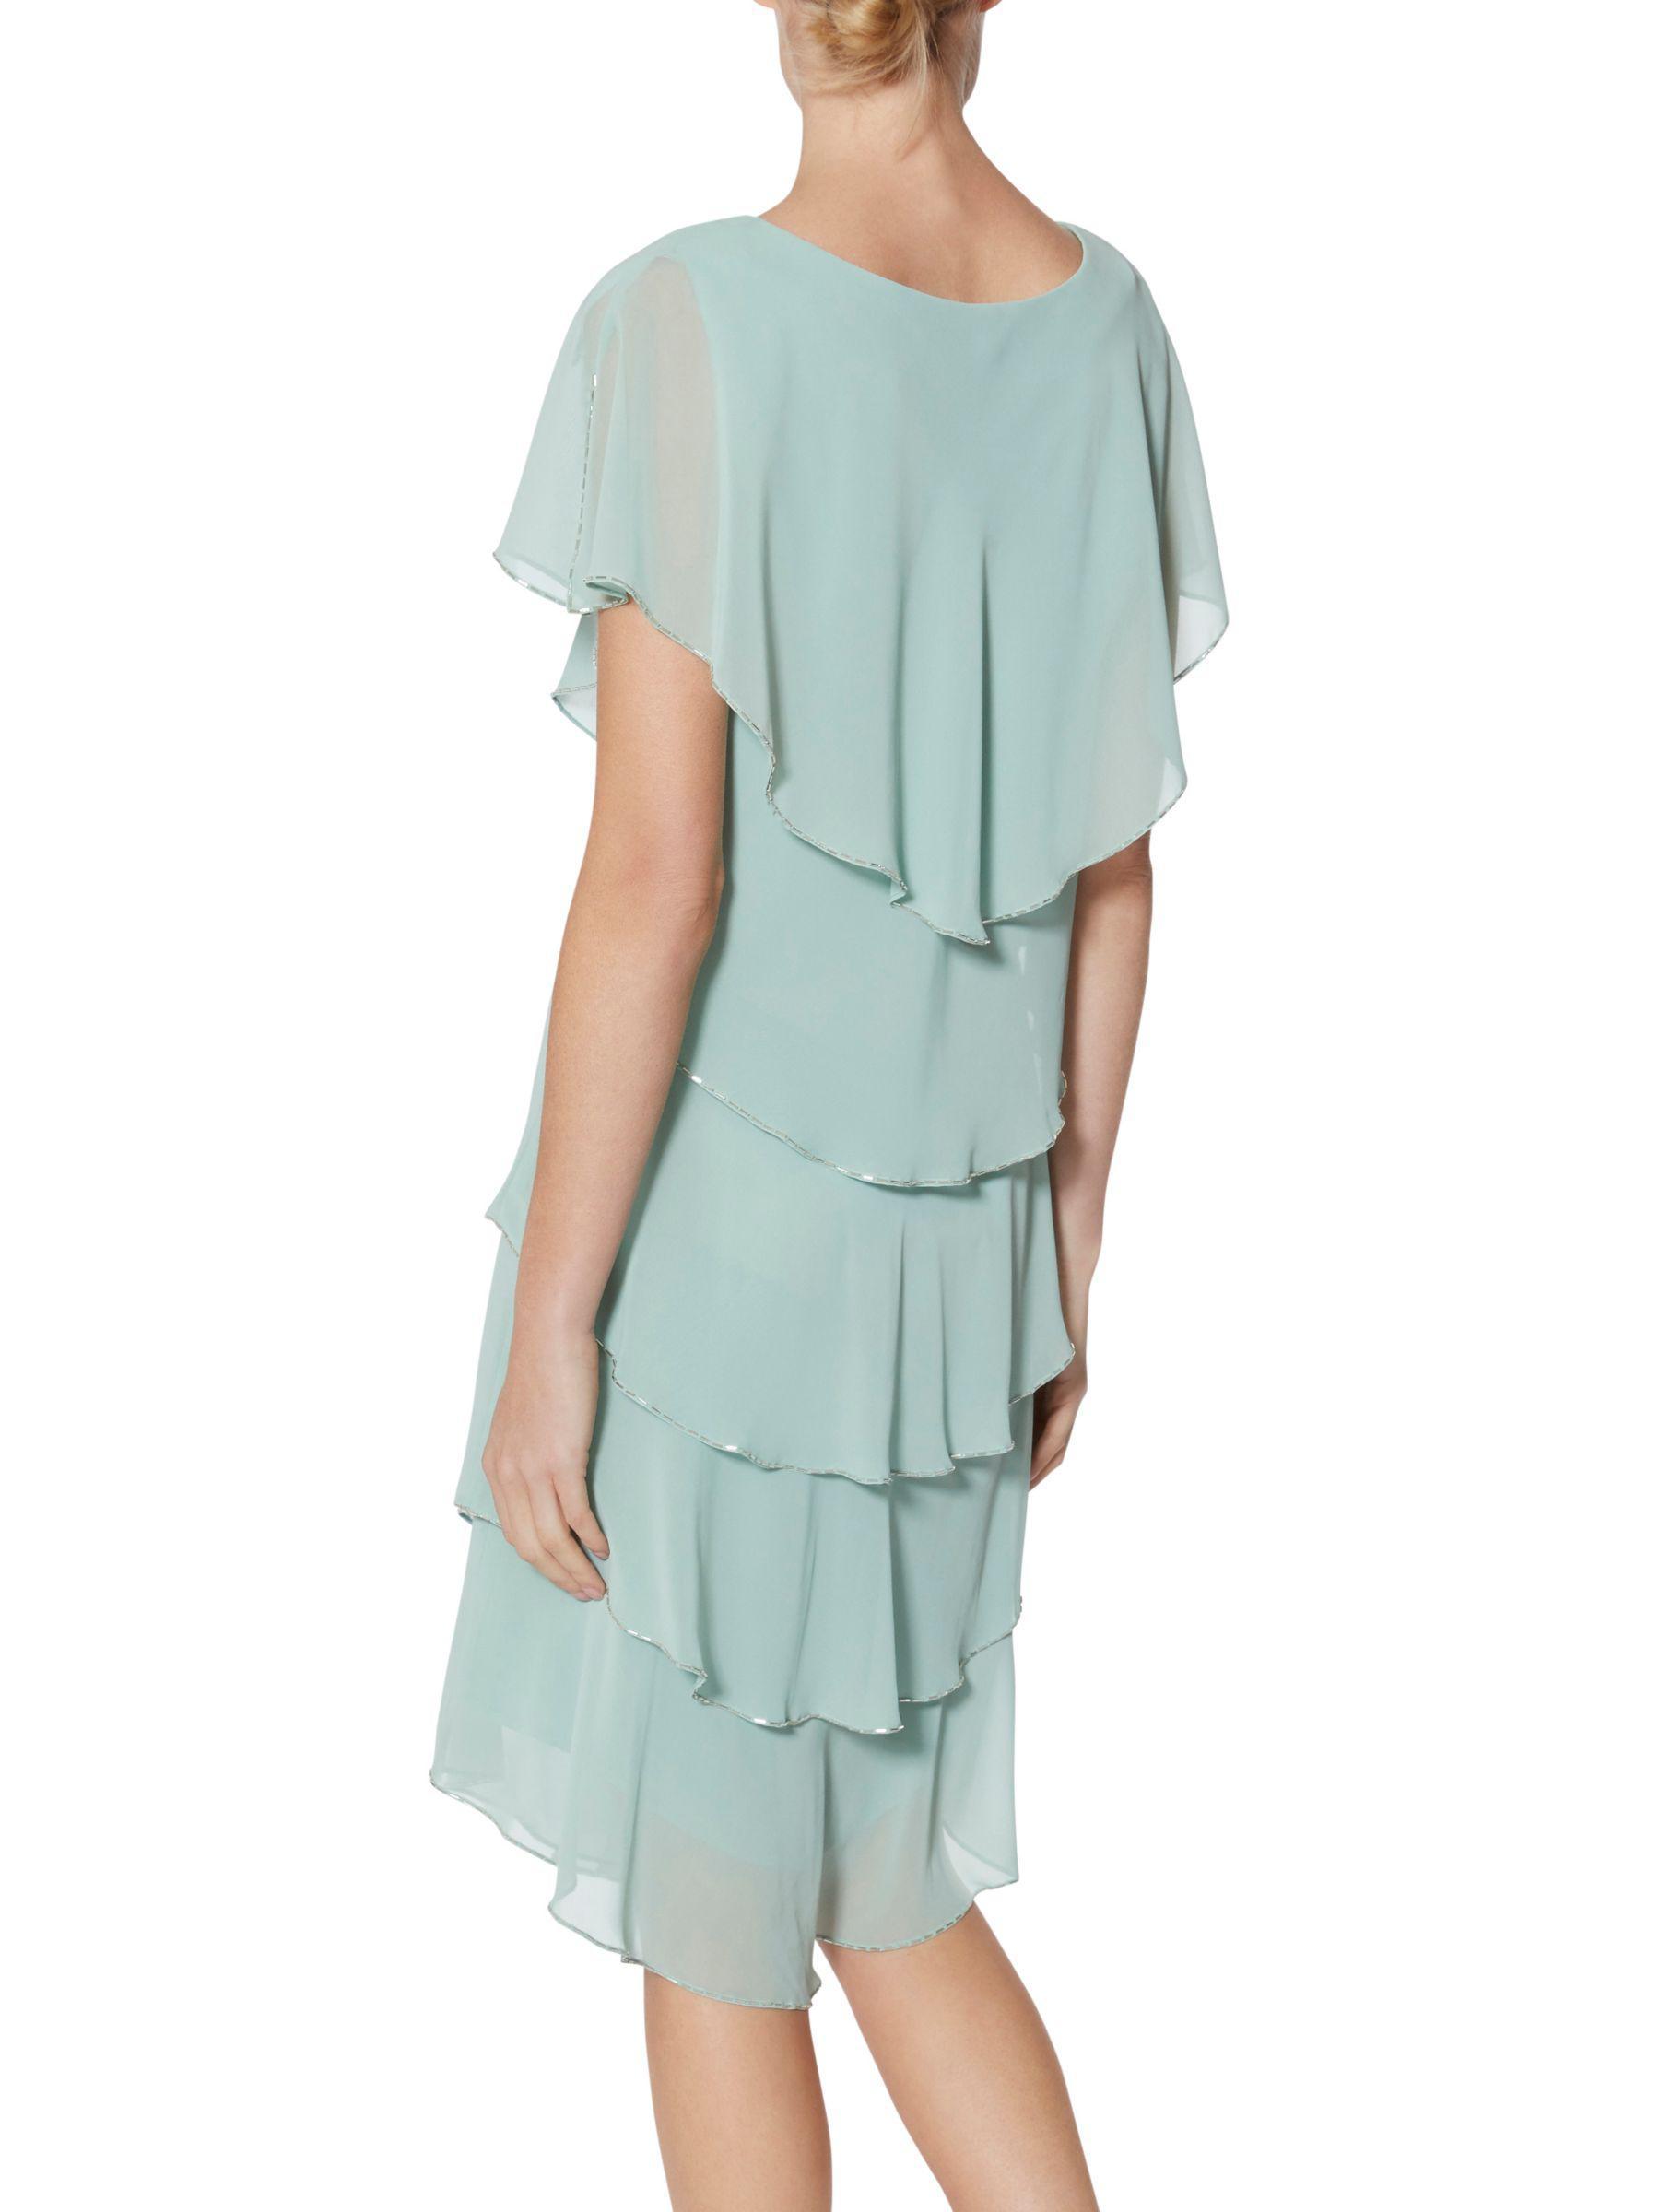 Lyst - John Lewis Gina Bacconi Roxanna Cape Dress in Blue